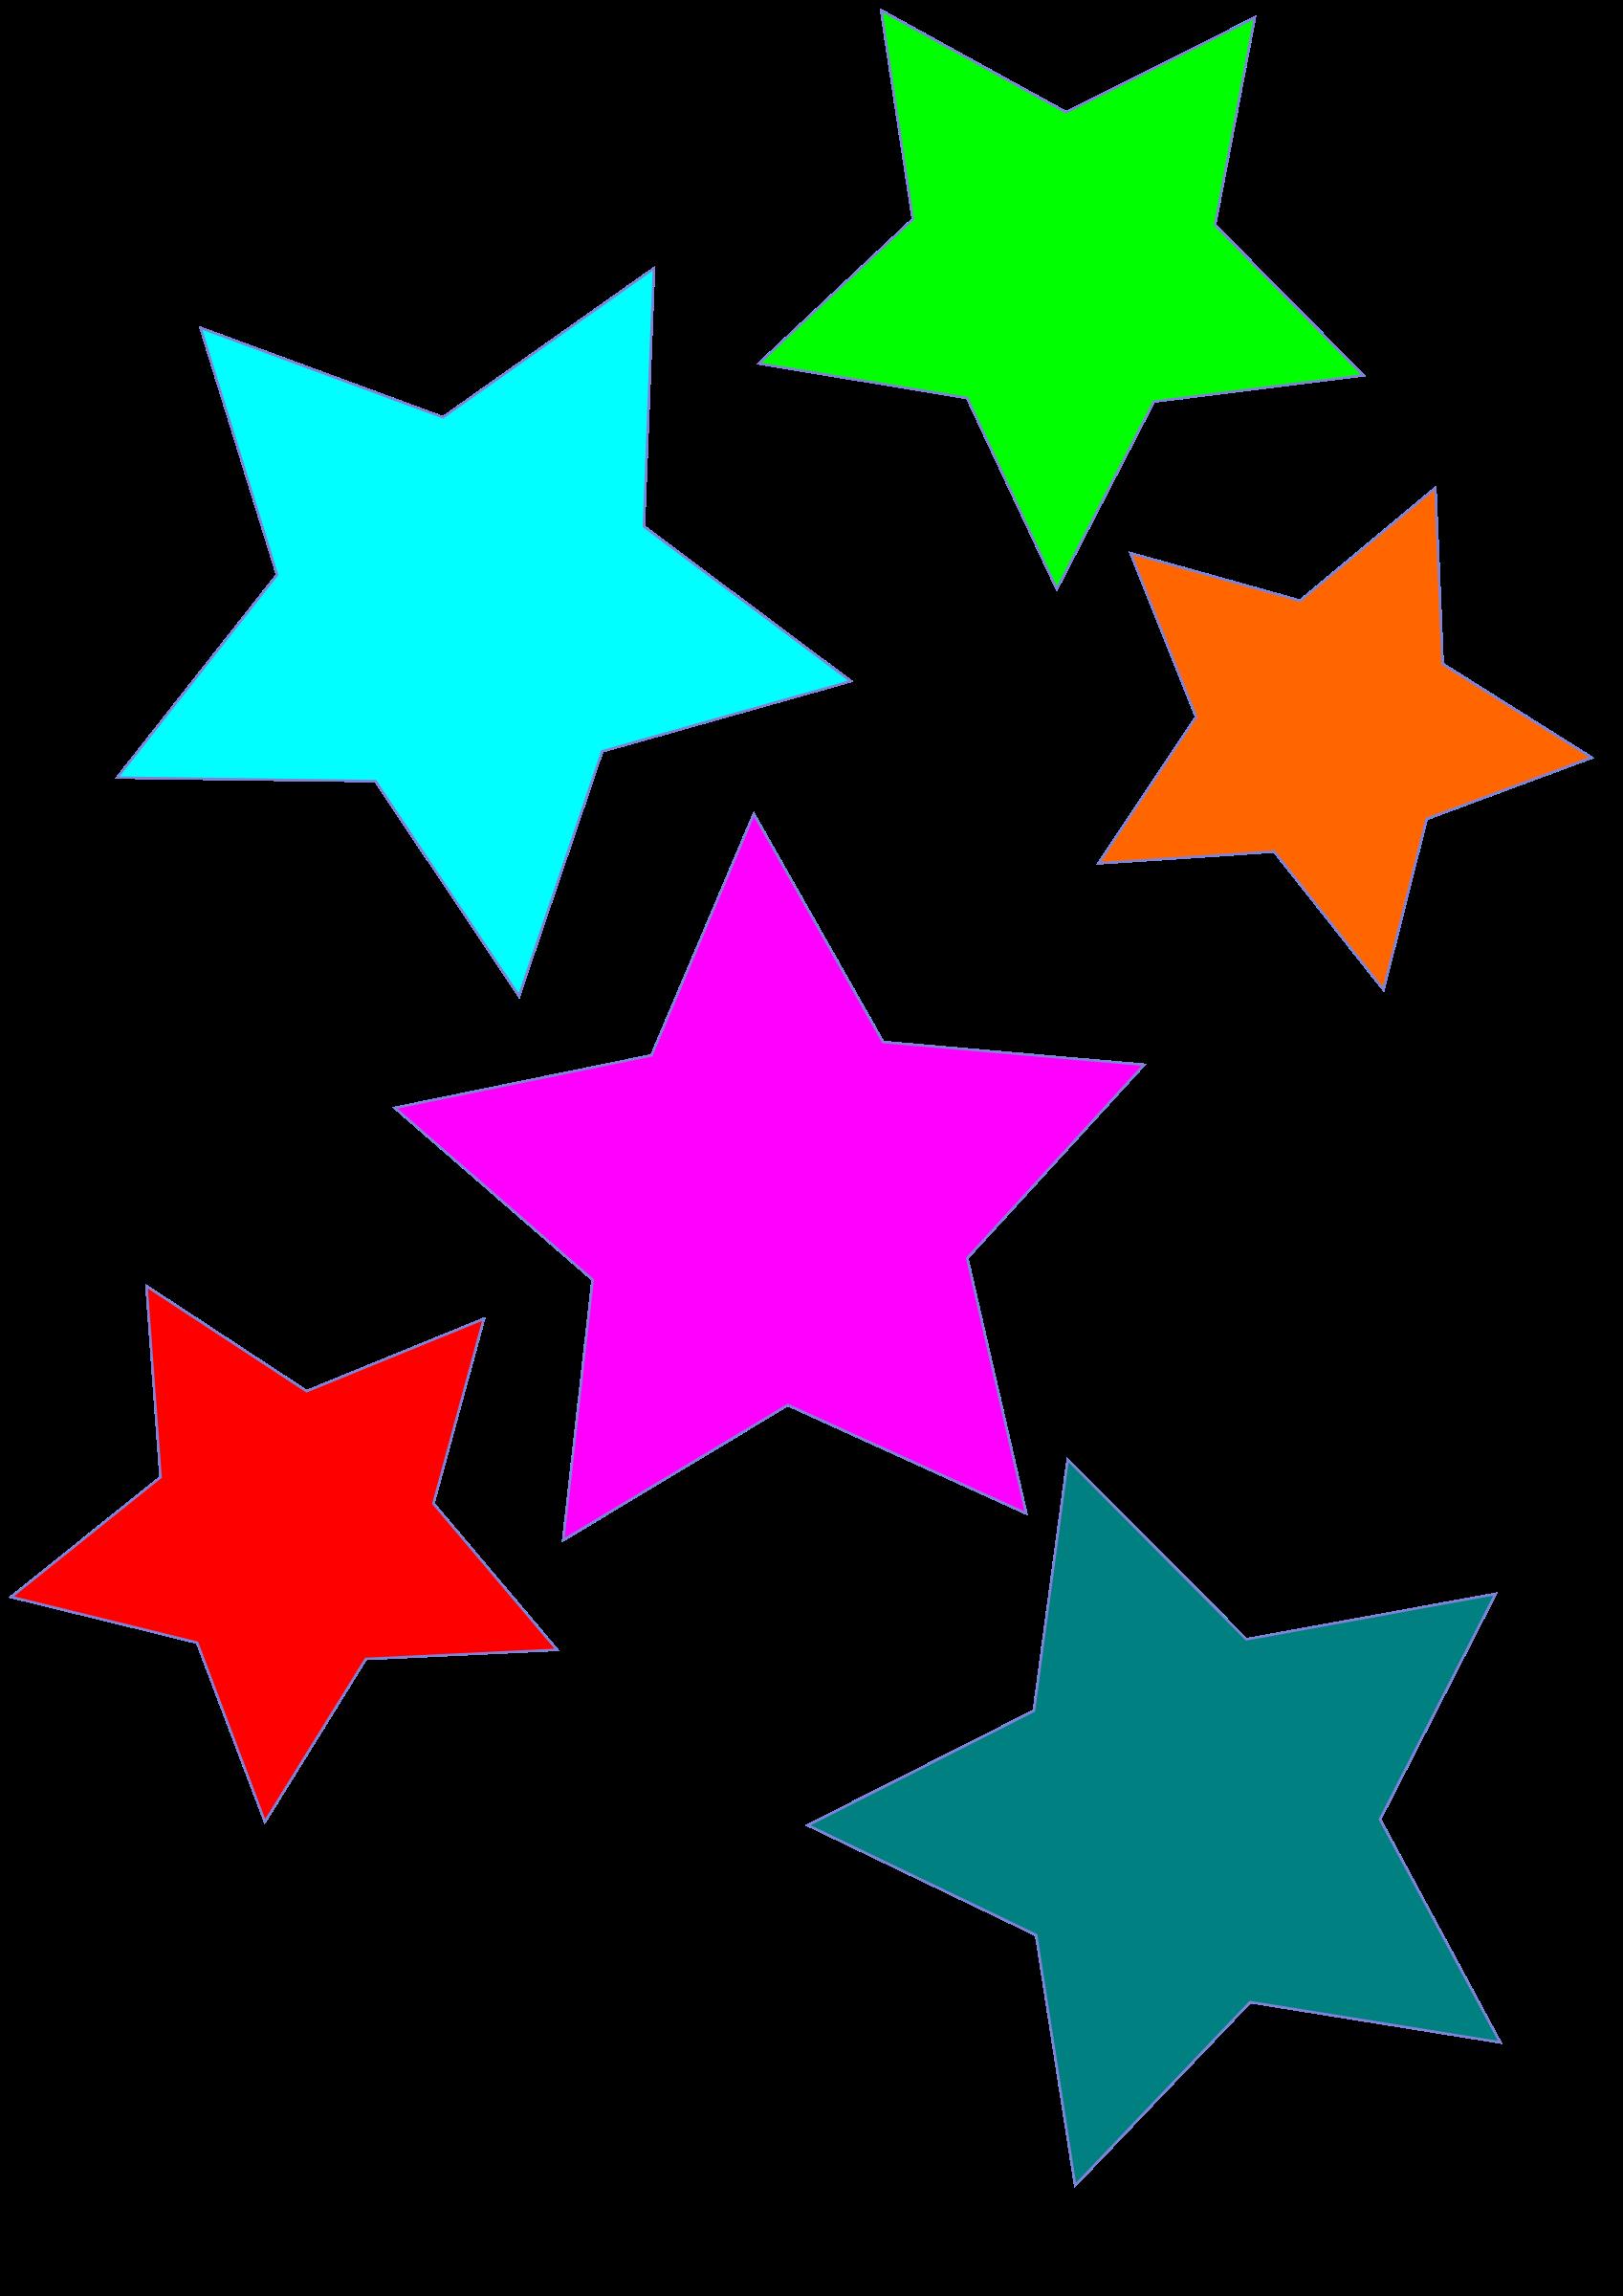 Mini star clipart graphic transparent download Clipart - Star graphic transparent download